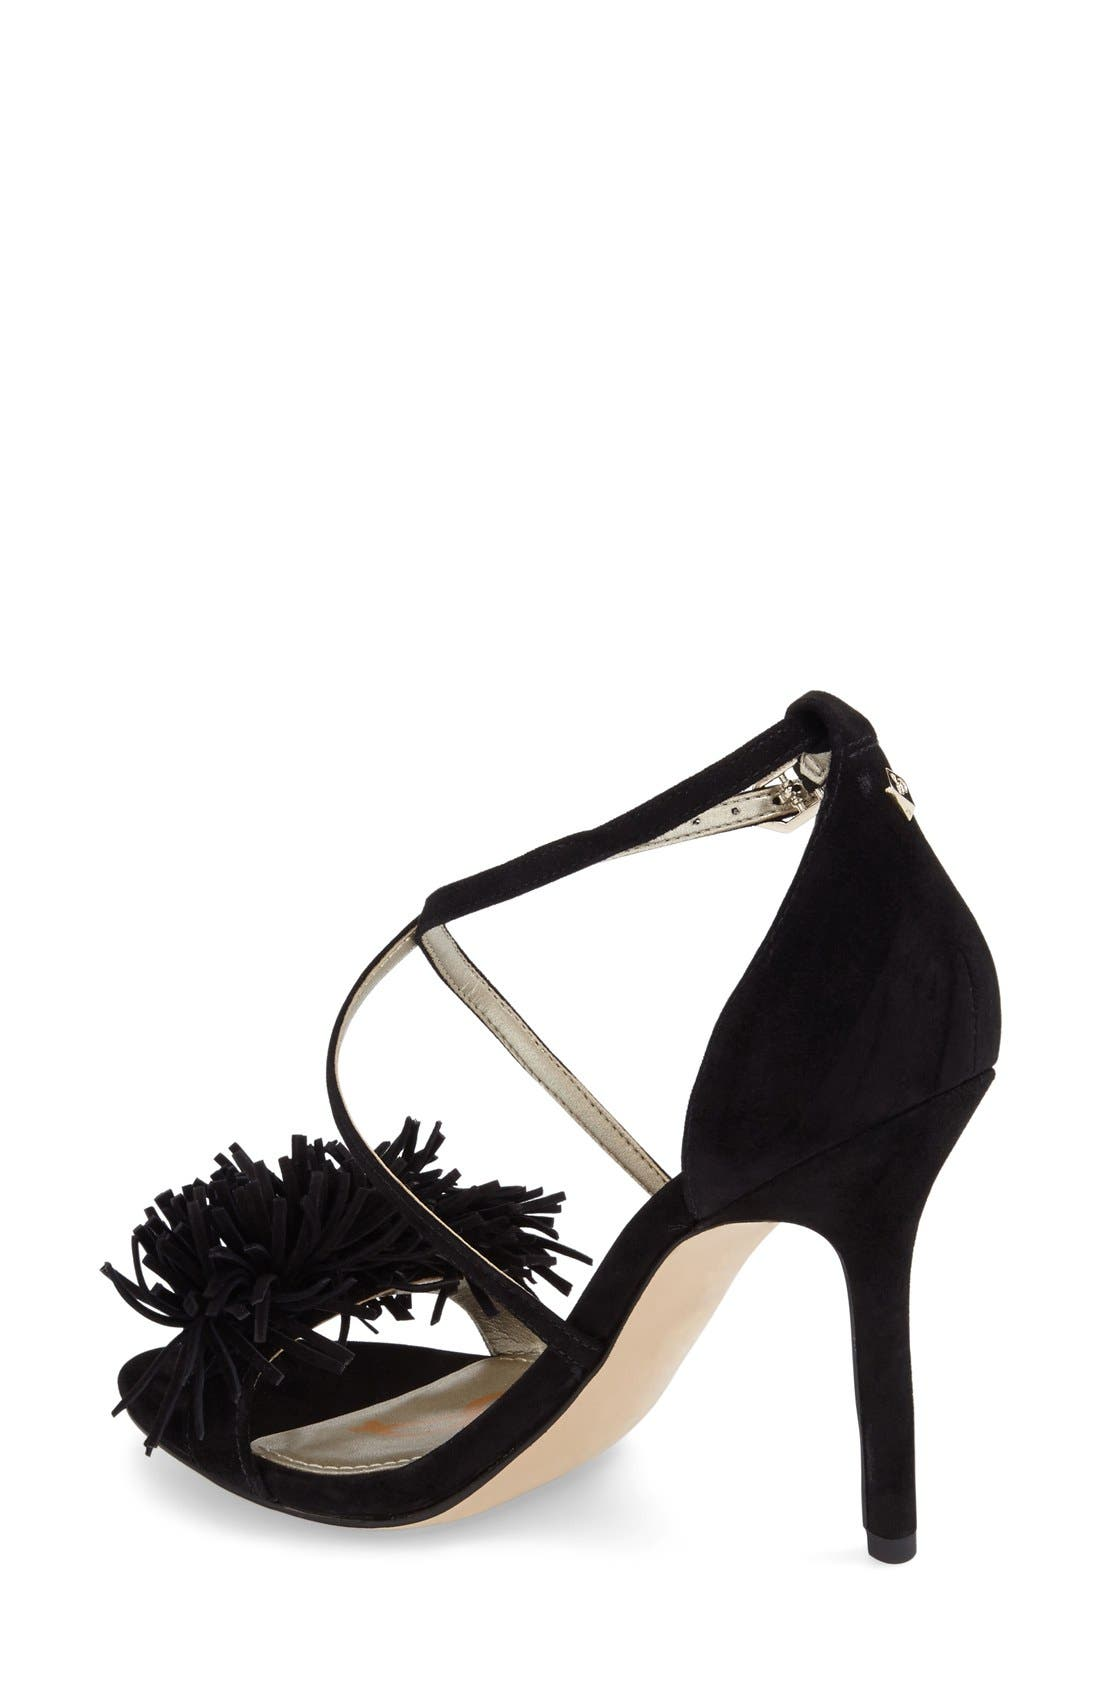 'Aisha' Fringe Sandal,                             Alternate thumbnail 2, color,                             Black Leather